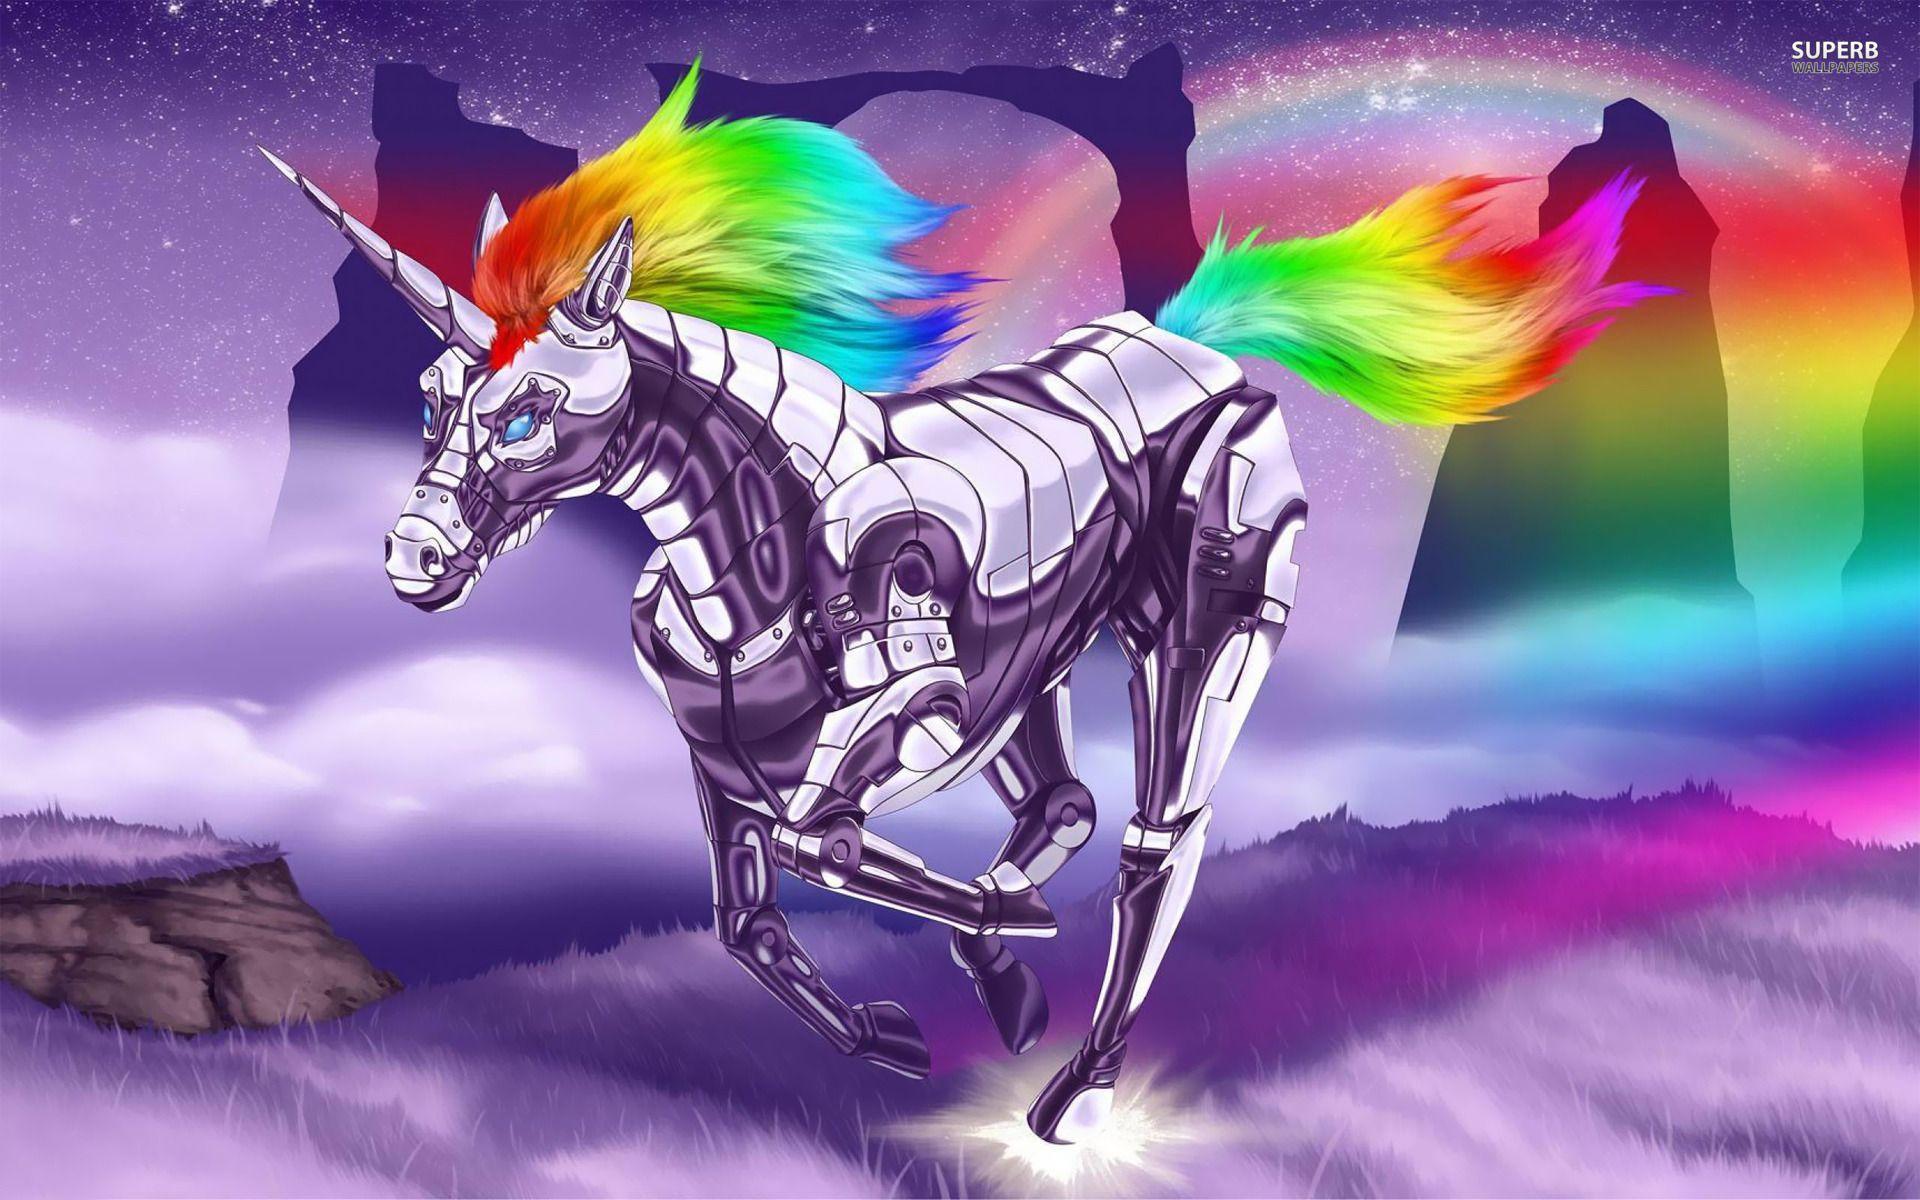 Robot Unicorn Unicorn Wallpaper Mythical Creatures Artistic Wallpaper